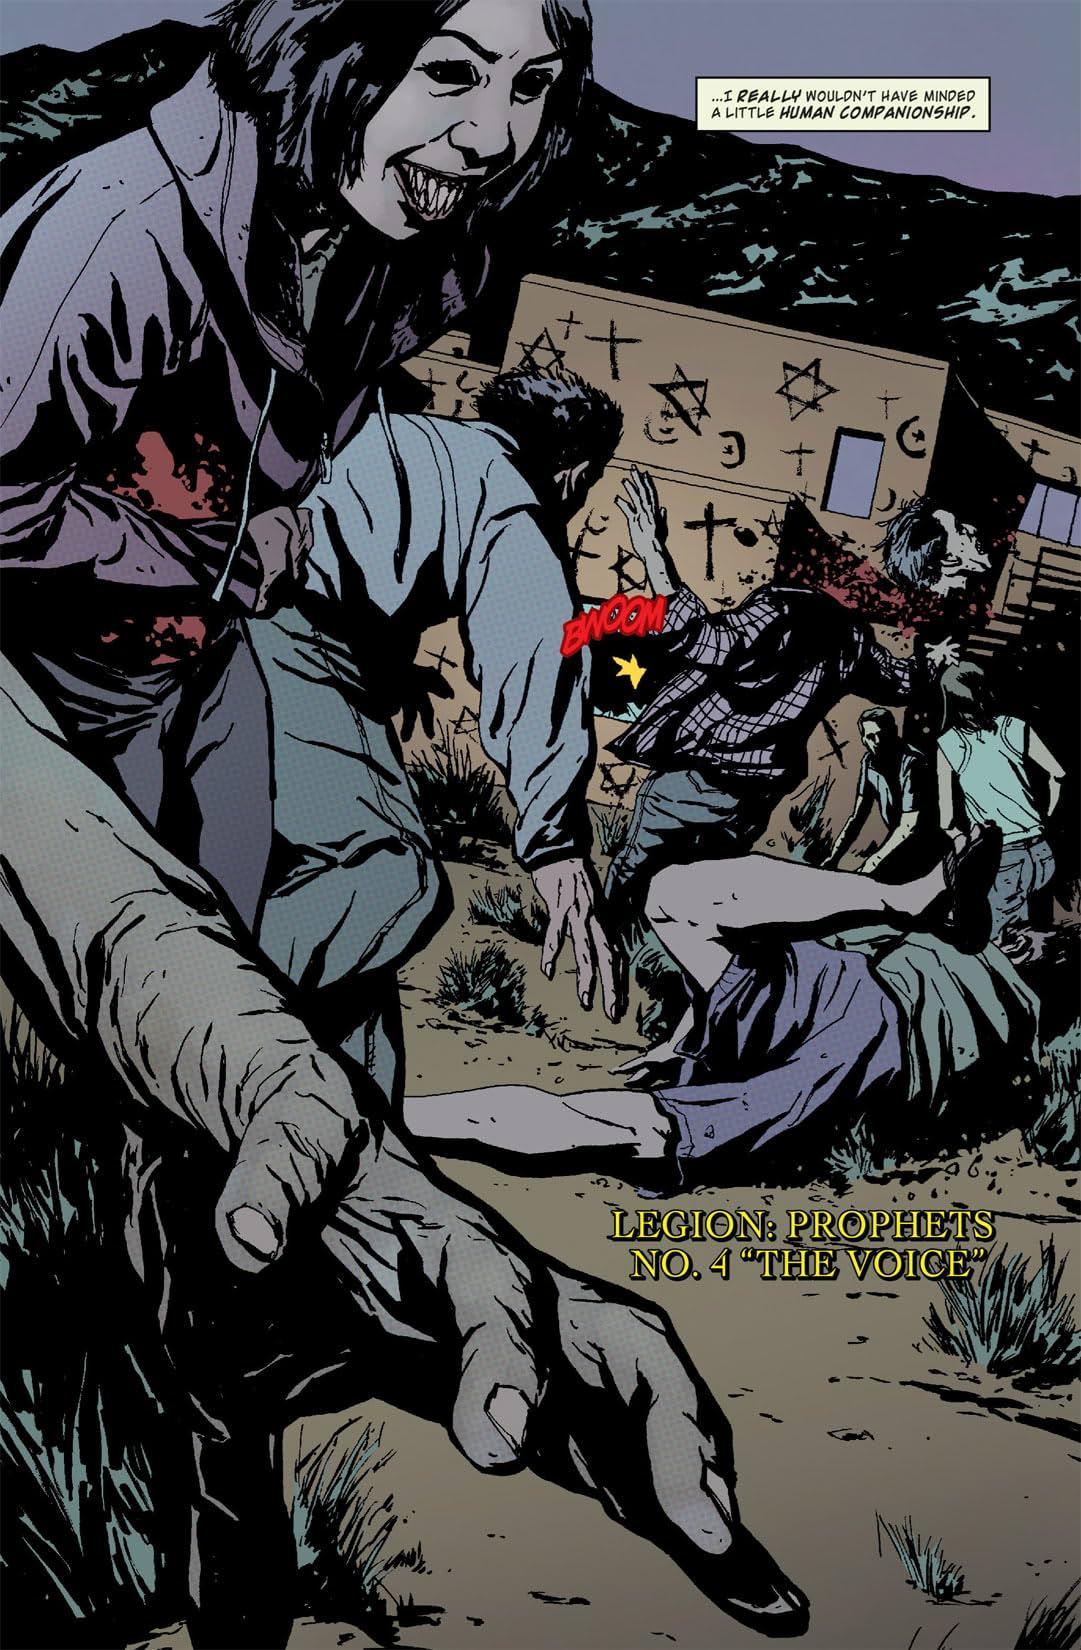 Legion: Prophets #4